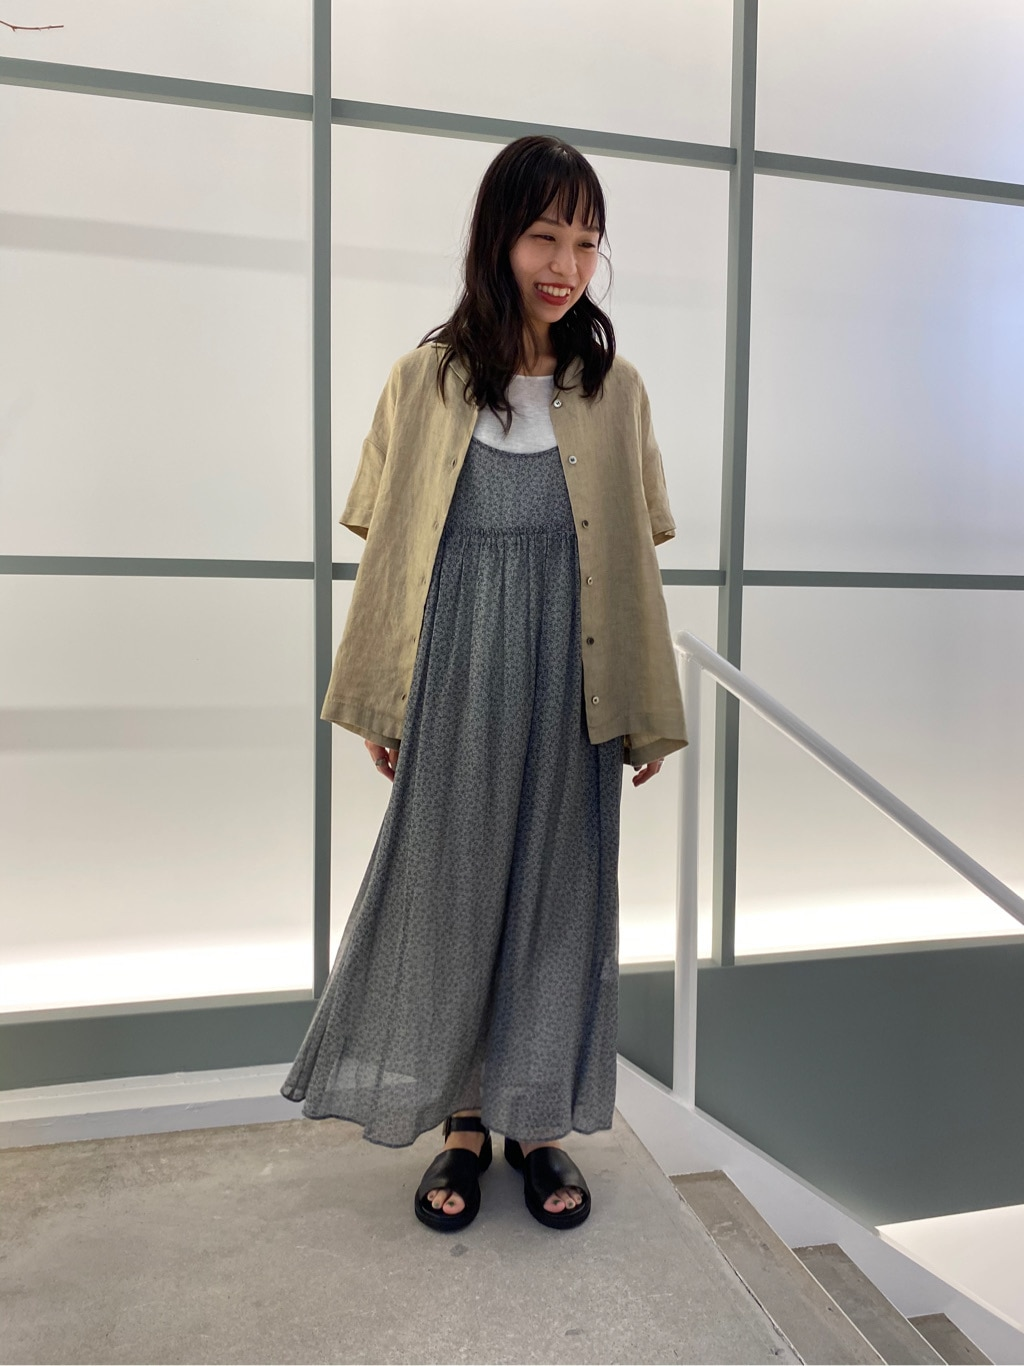 - bulle de savon FLAT AMB 名古屋栄路面 身長:152cm 2020.07.29